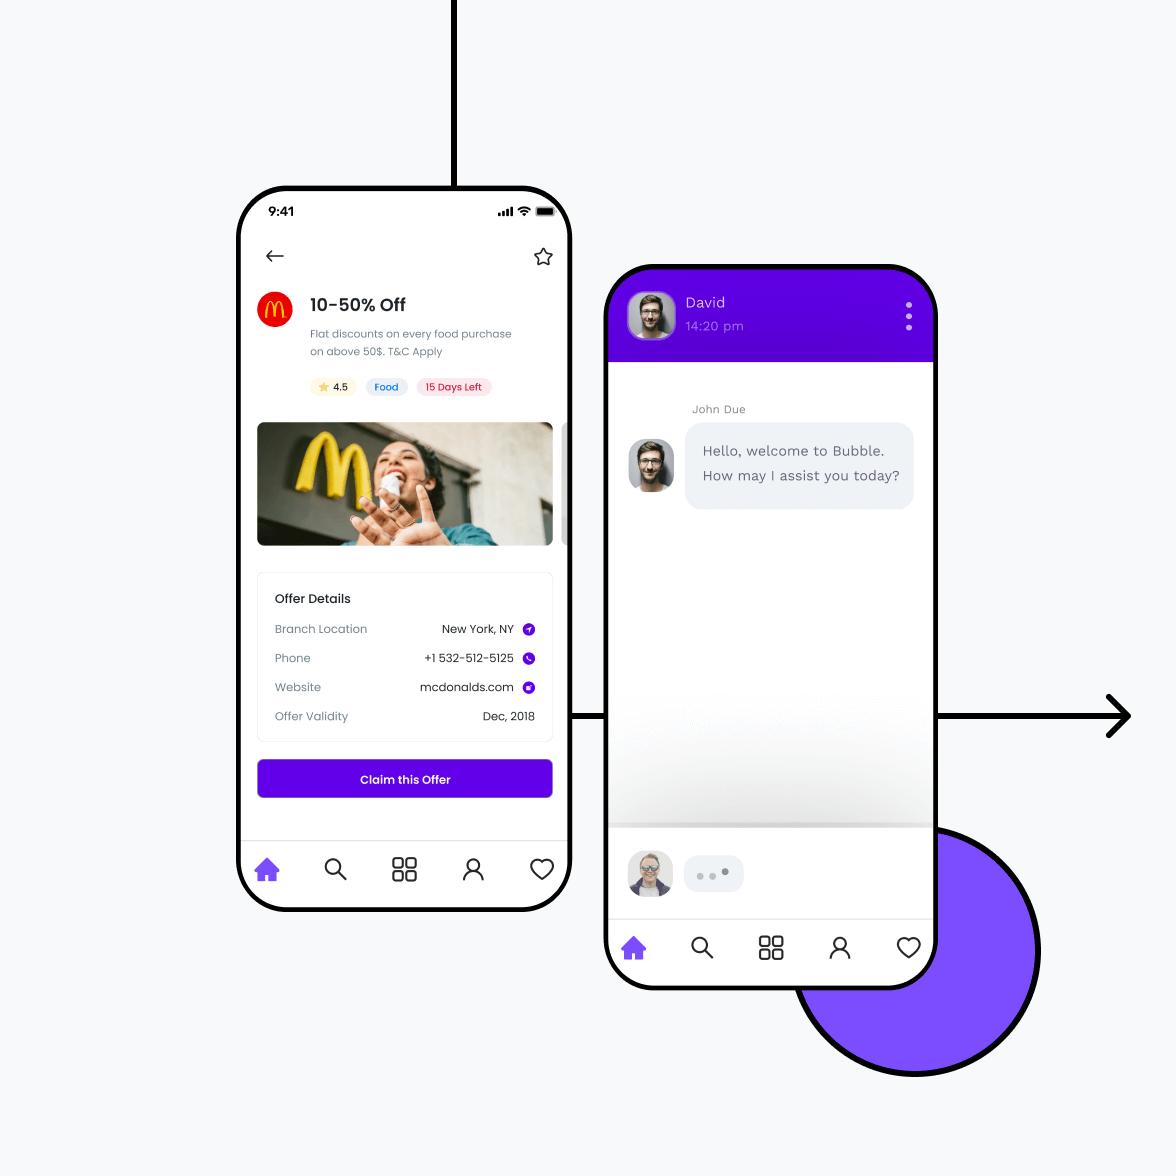 Daily deal app offer details